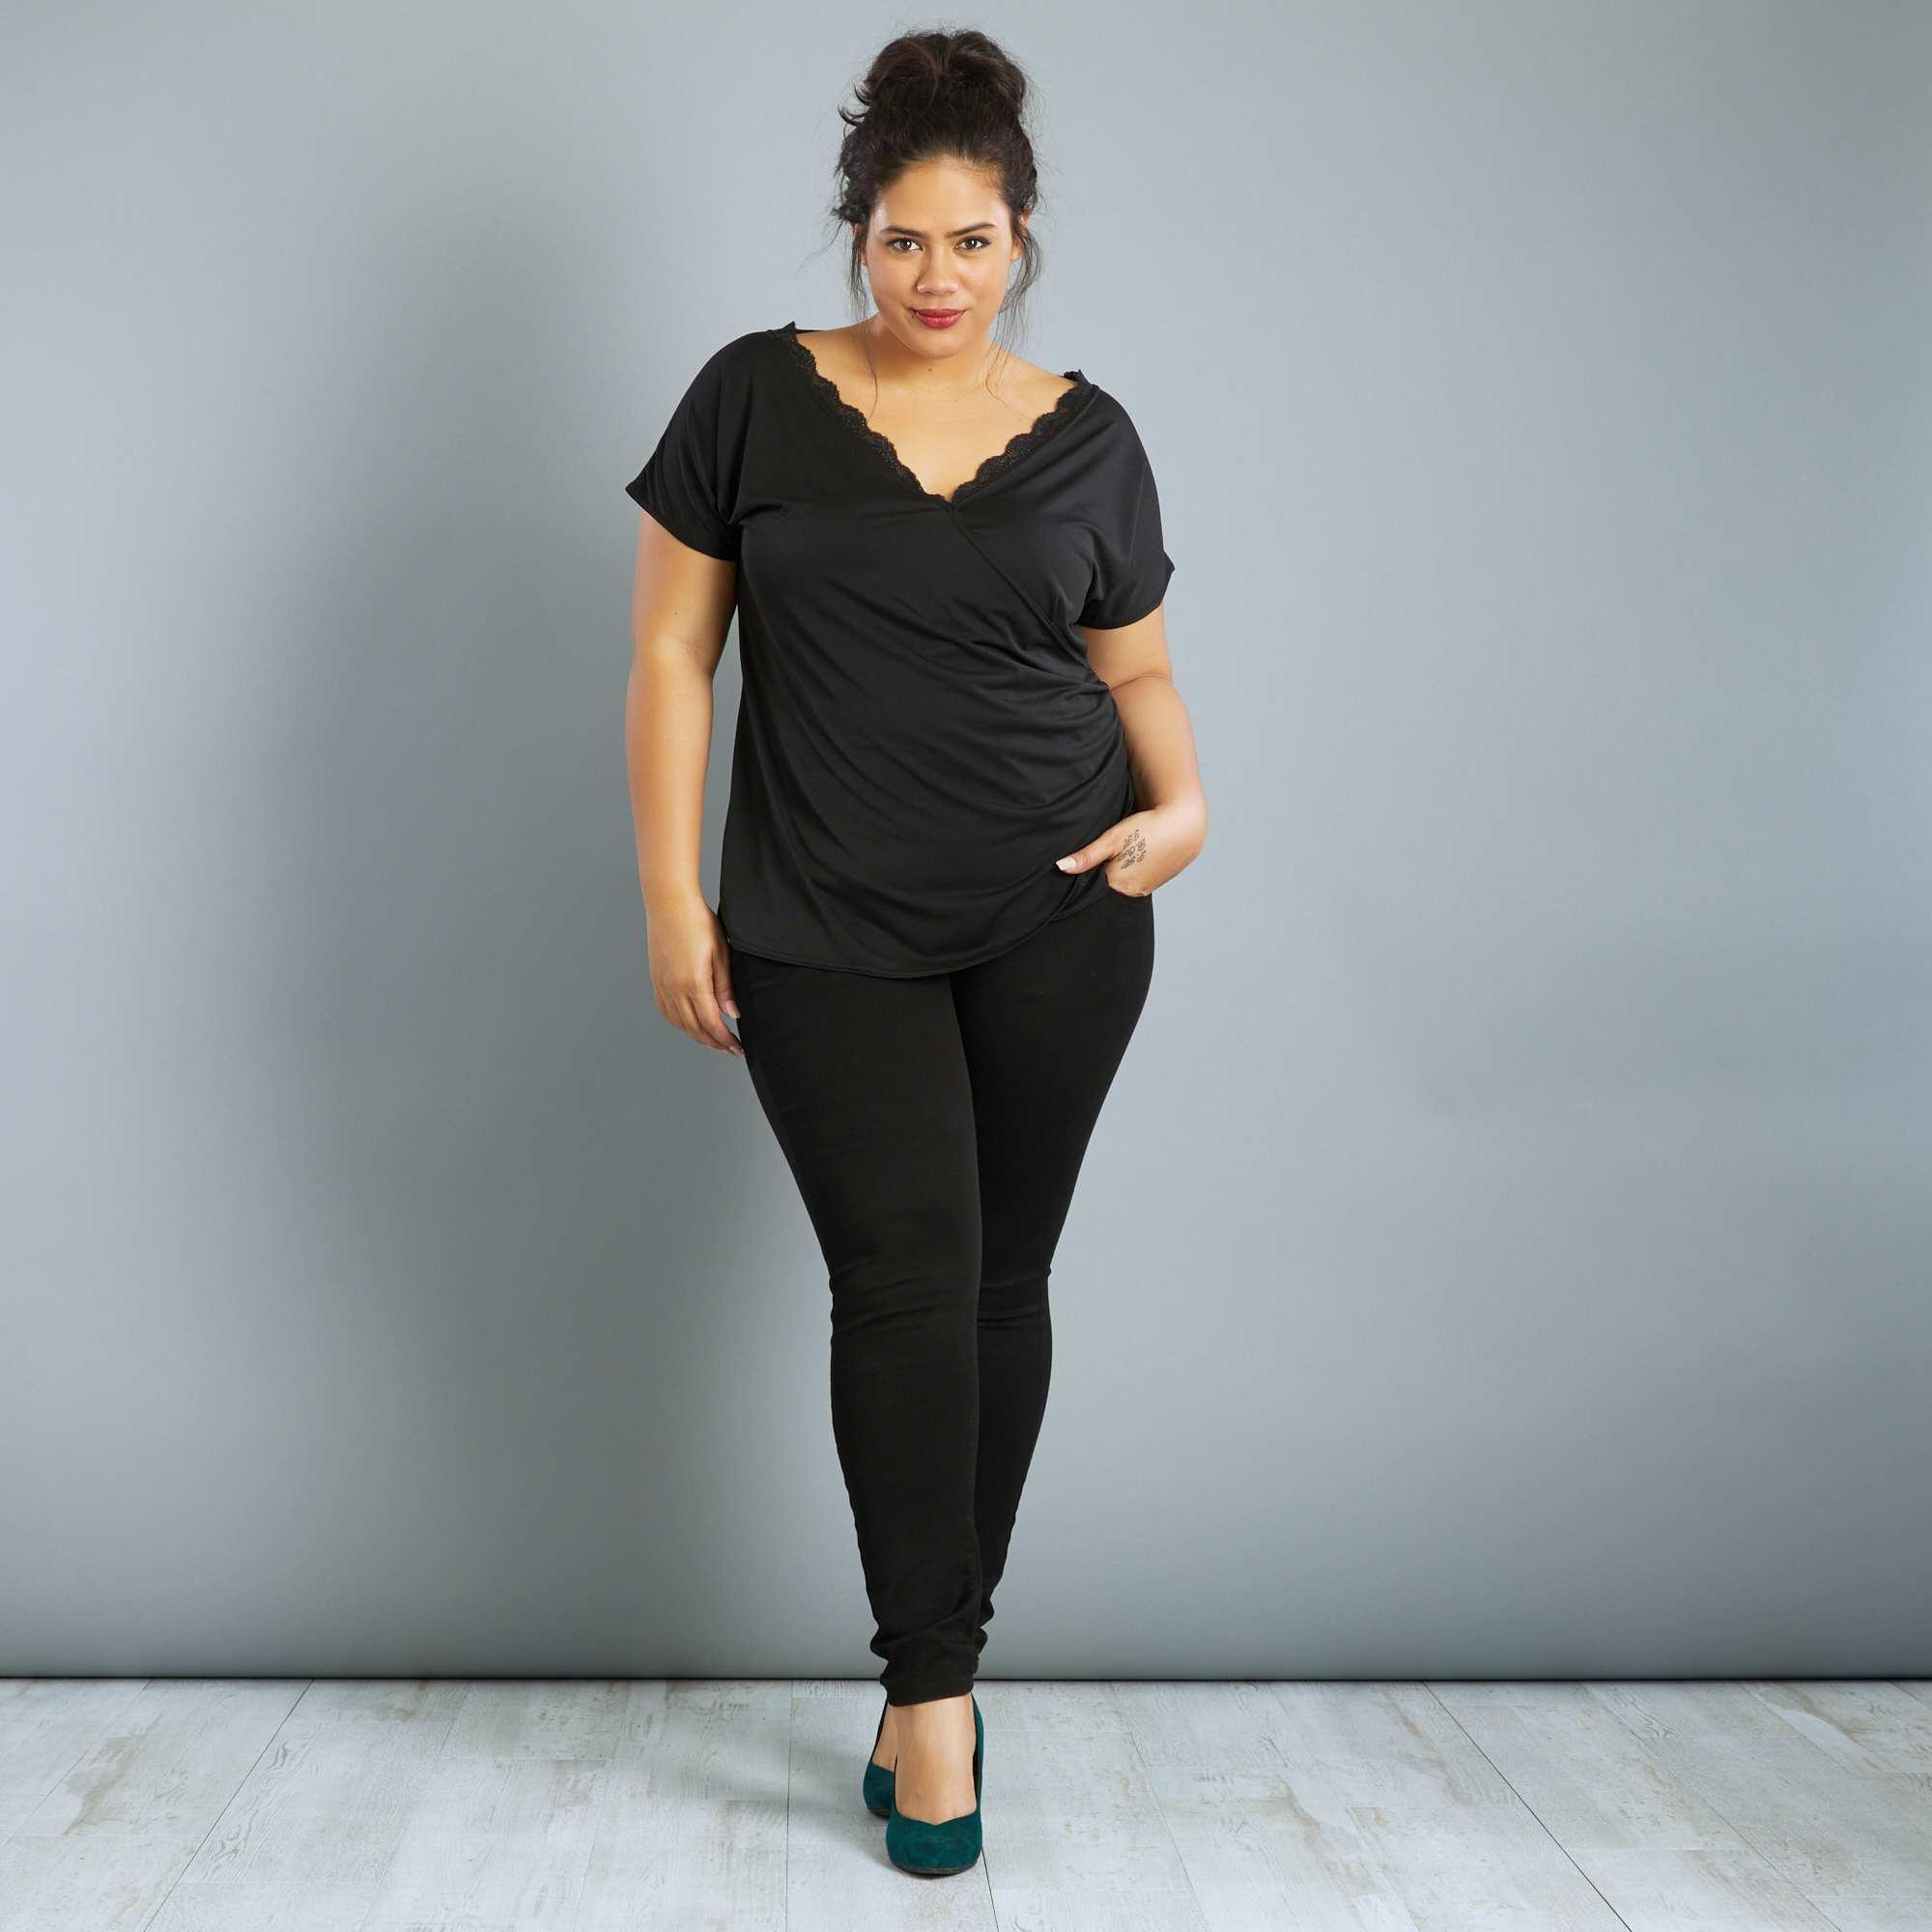 575ea65af08 Tee-shirt col cache-cœur avec dentelle noir Grande taille femme. Loading  zoom